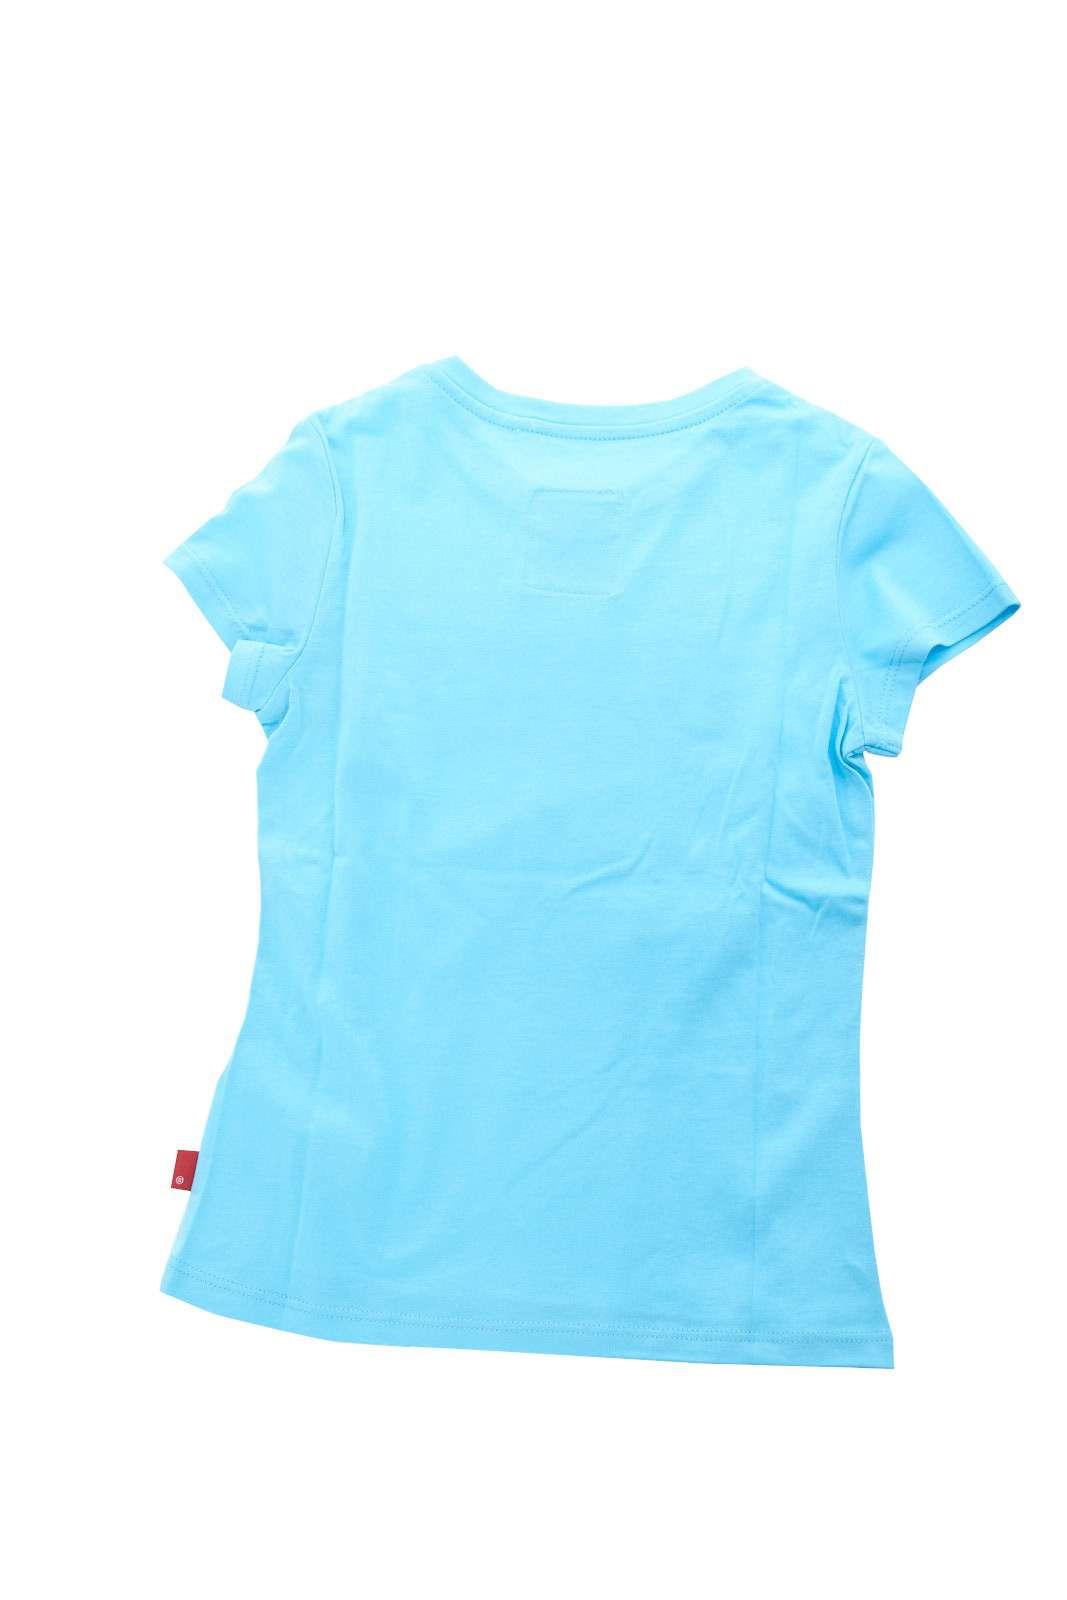 https://www.parmax.com/media/catalog/product/a/i/PE-outlet_parmax-t-shirt-levis-NN1057-B_1.jpg